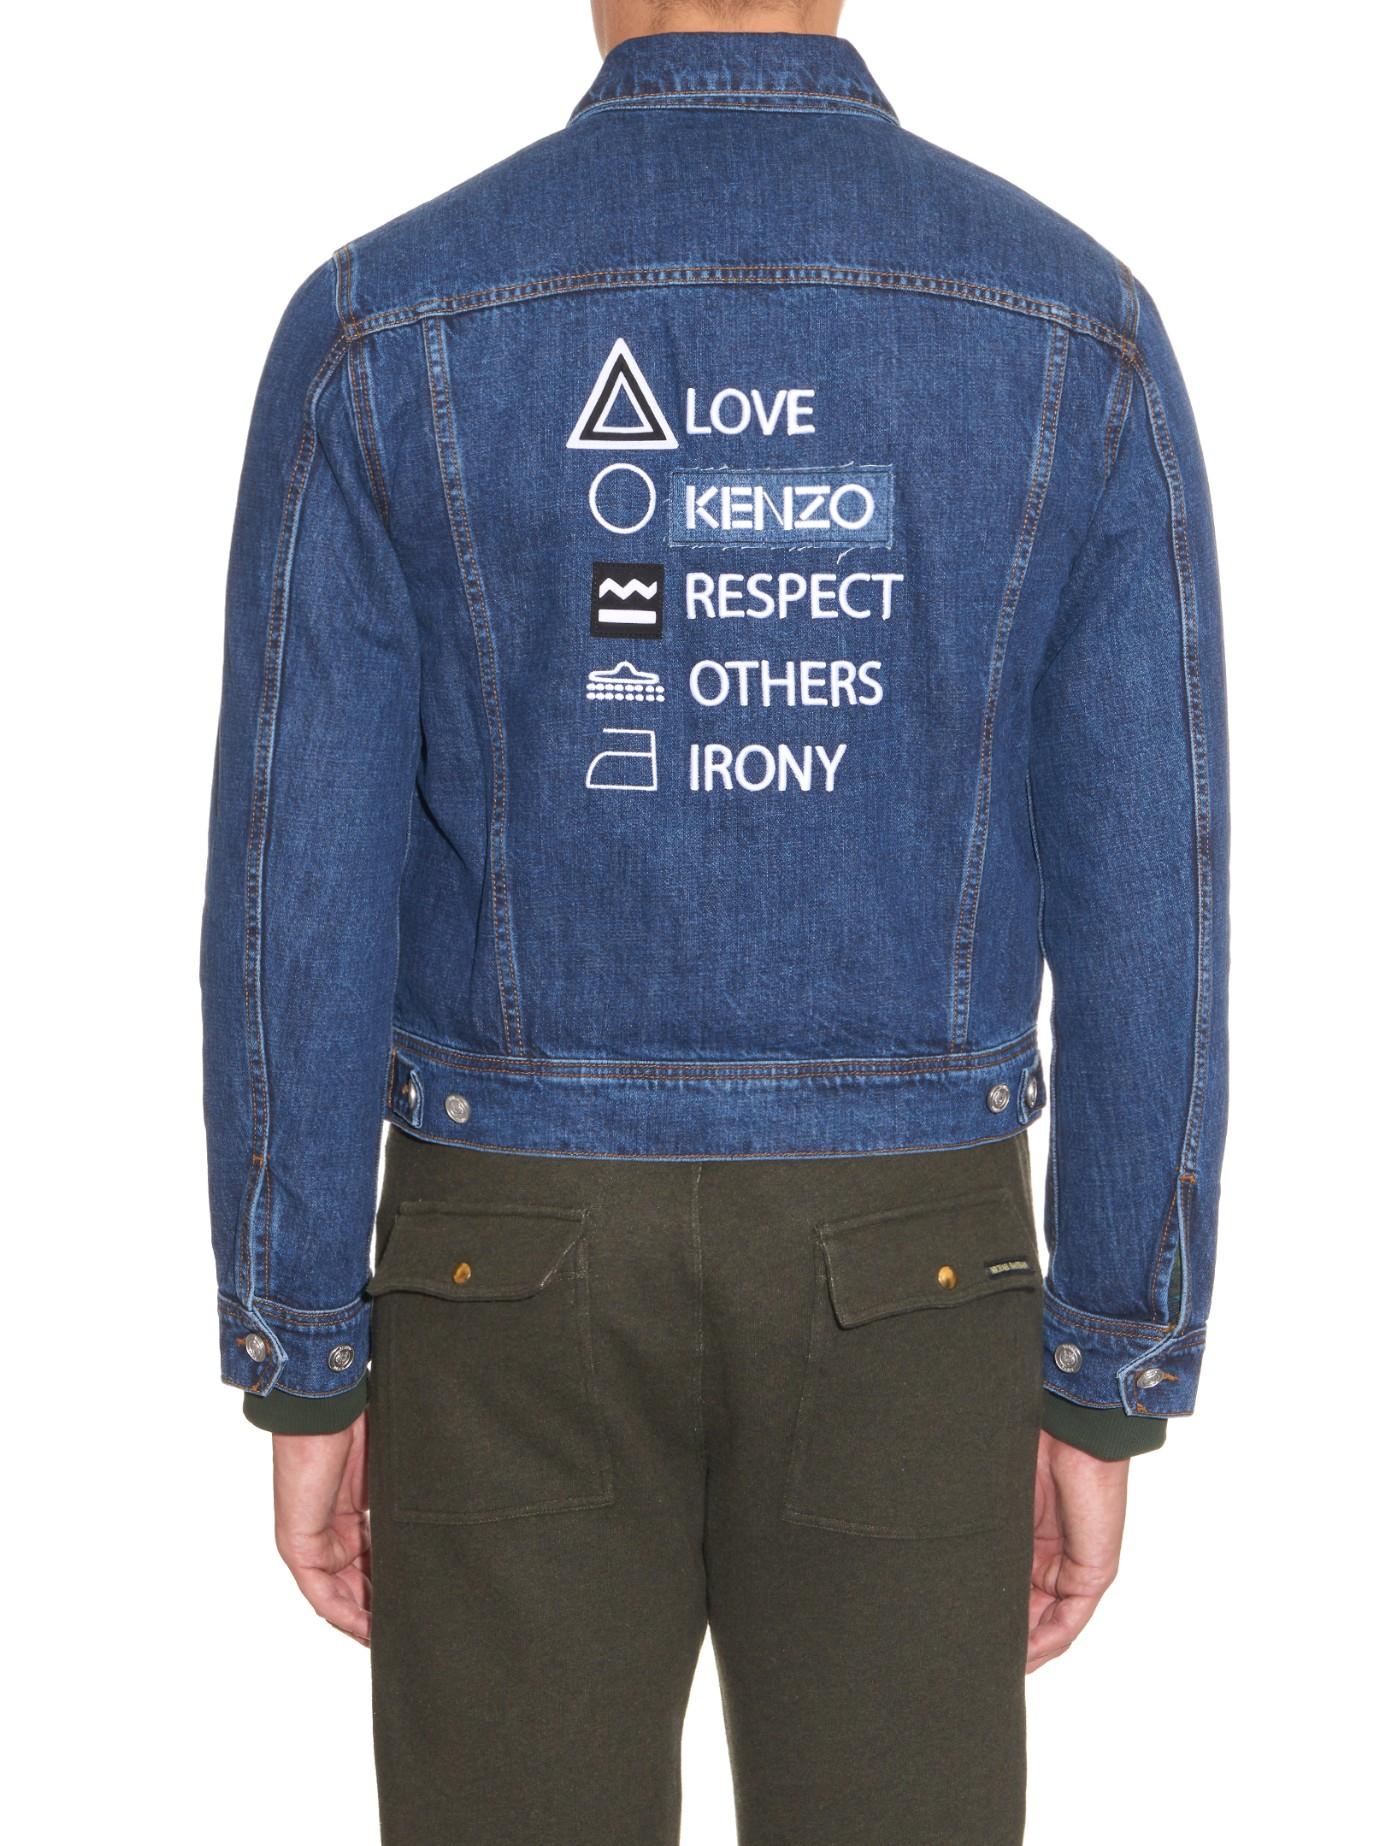 Kenzo Embroidered Back Denim Jacket In Blue For Men Lyst